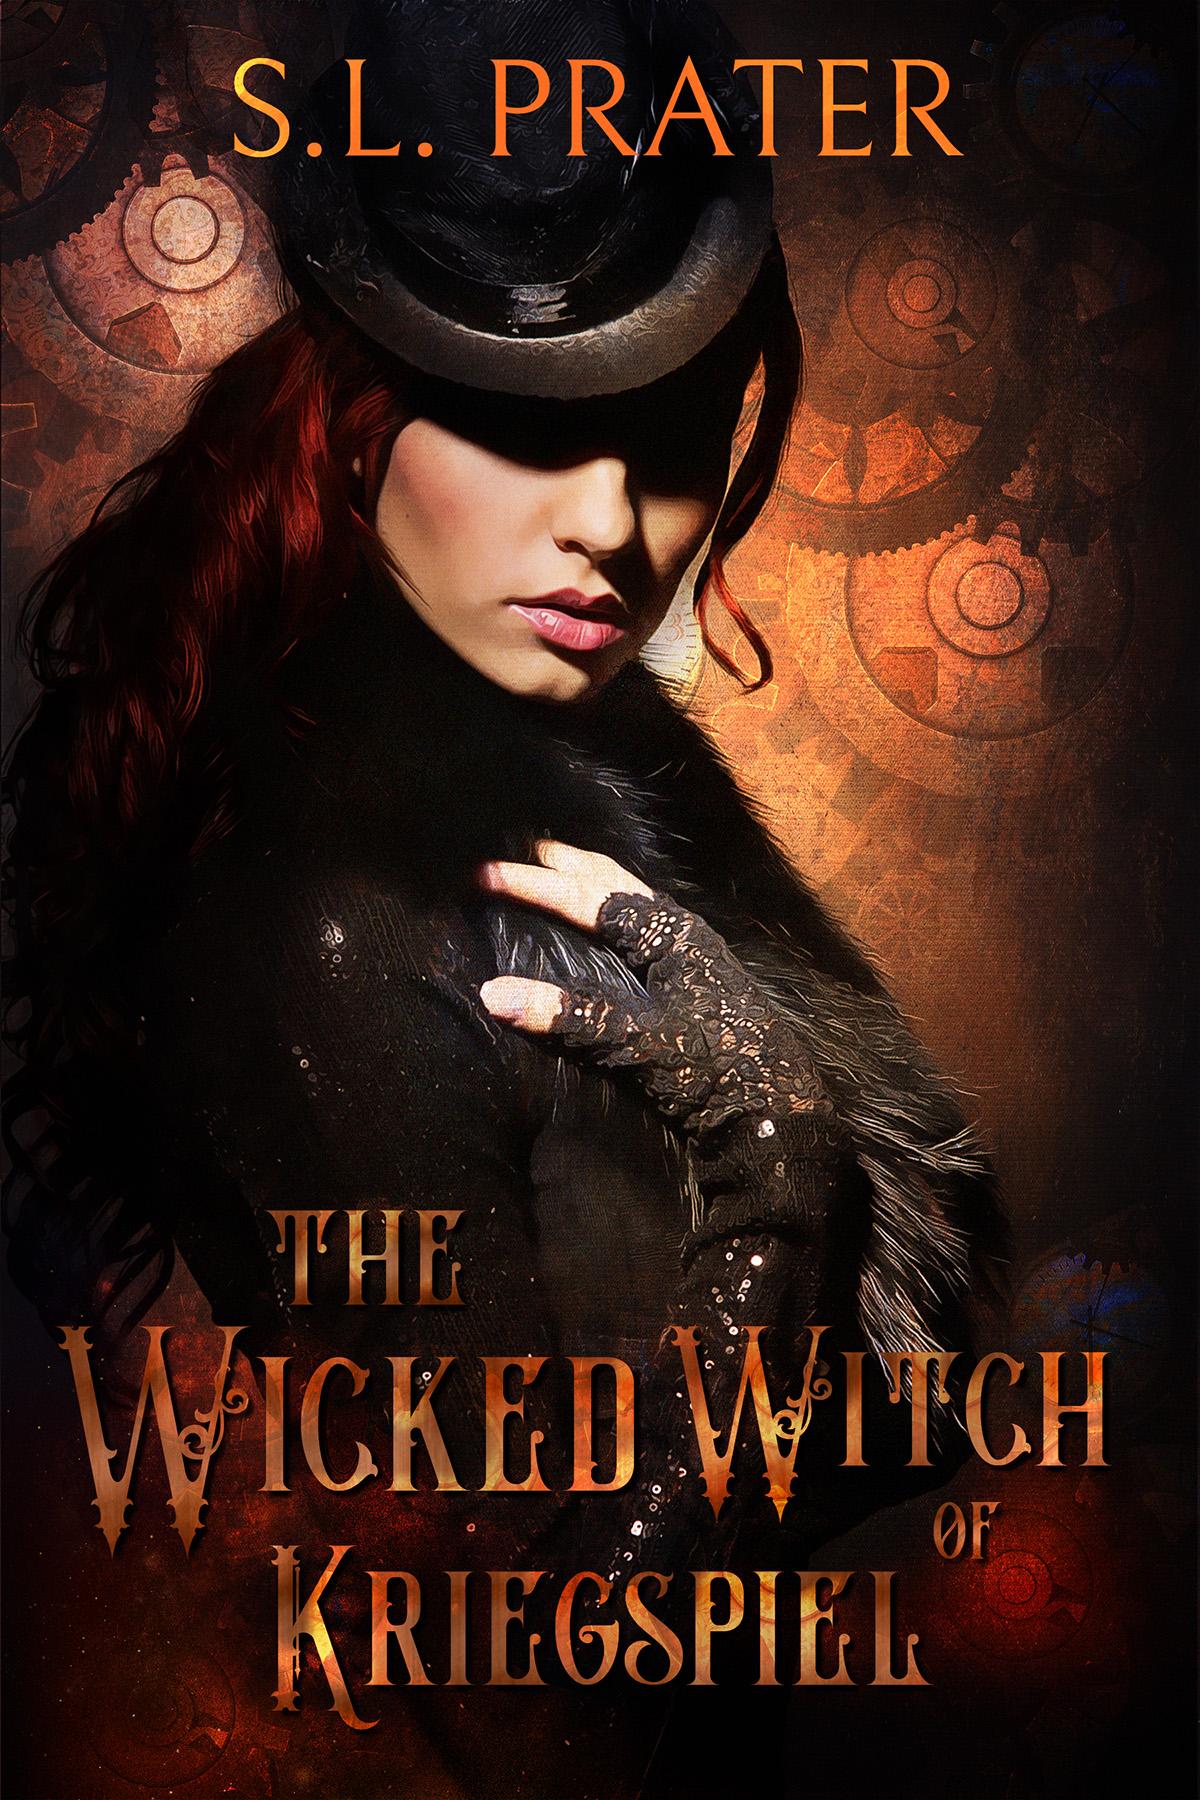 The Wicked Witch of Kriegspiel